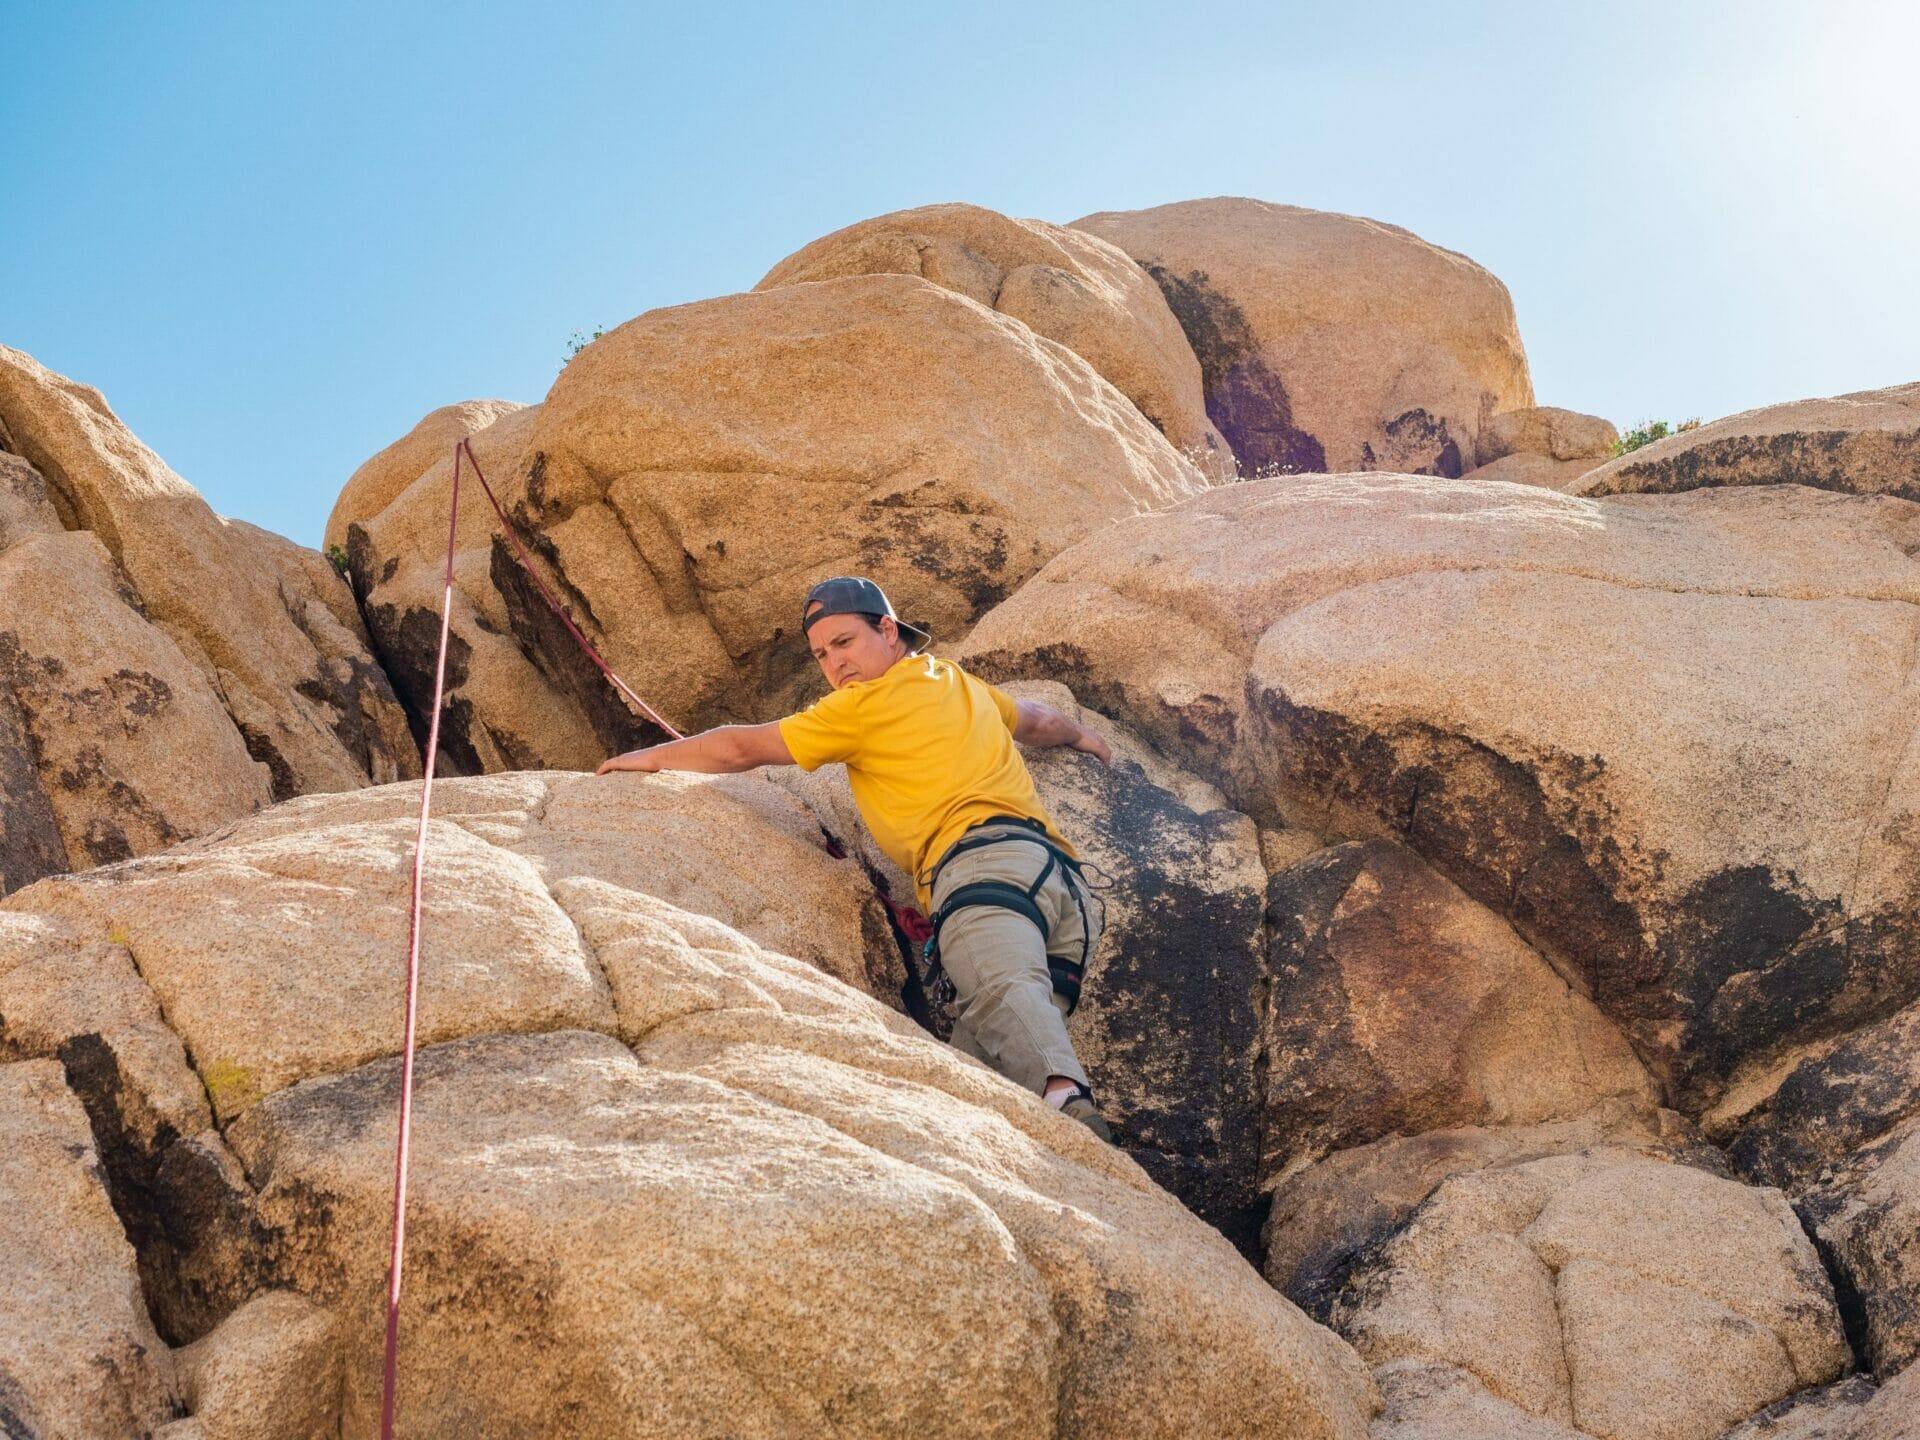 Rock climbing Spider Wall Indian Cove Joshua Tree National Park